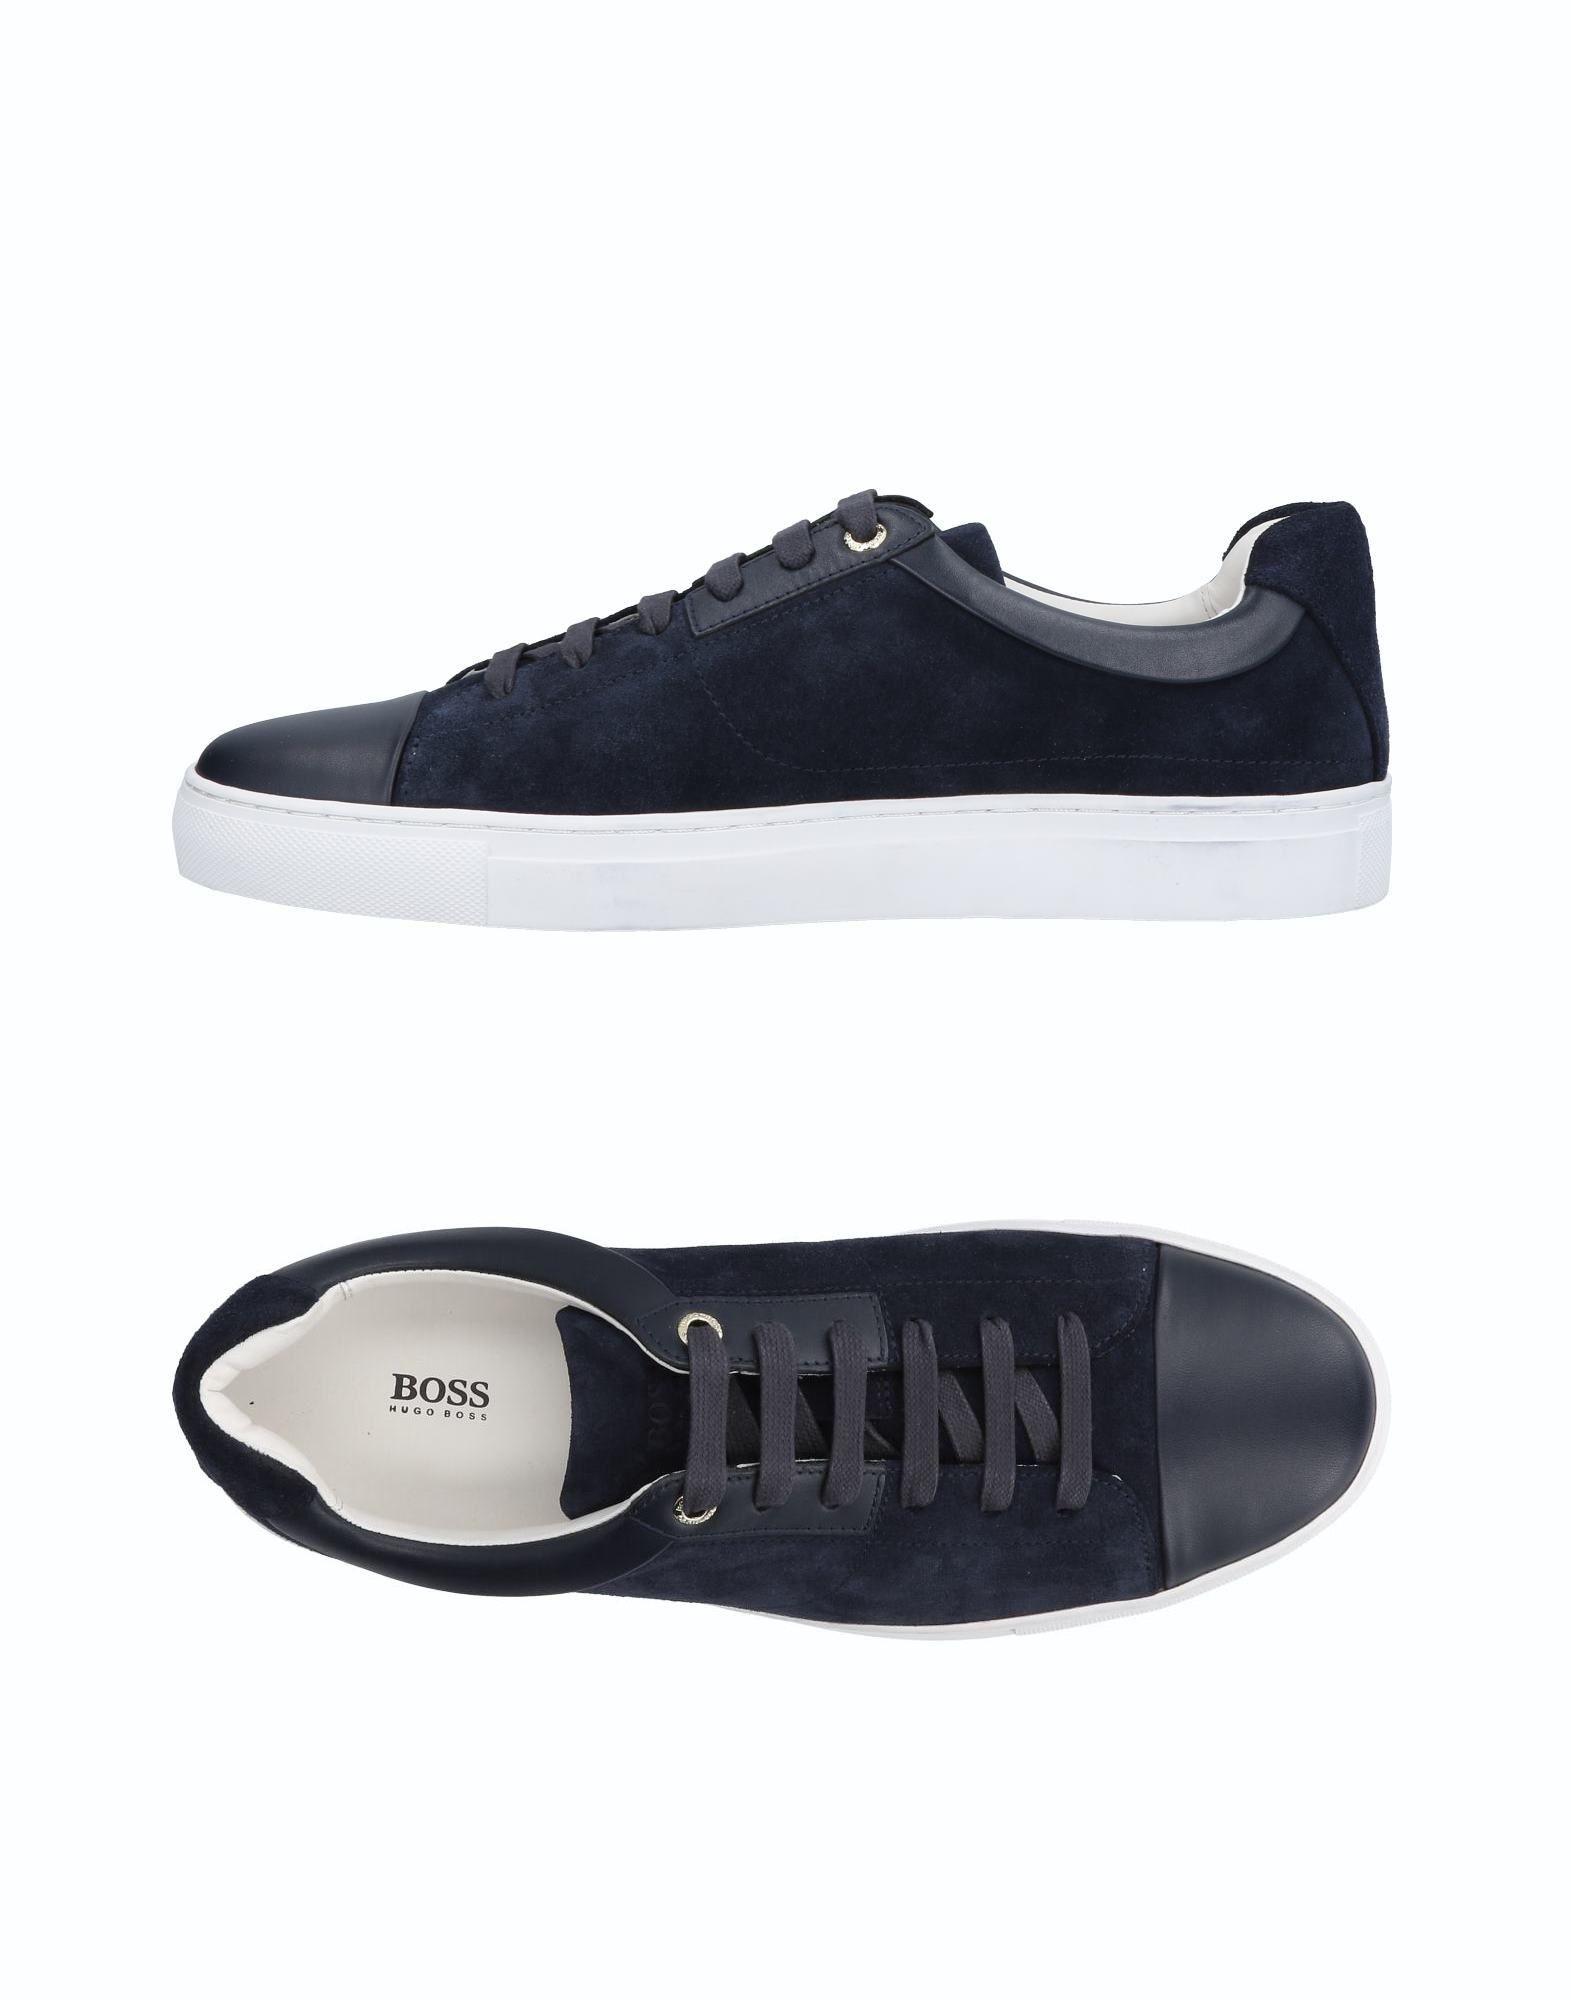 BOSS BLACK Низкие кеды и кроссовки кеды кроссовки низкие reef ridge premium heathered black